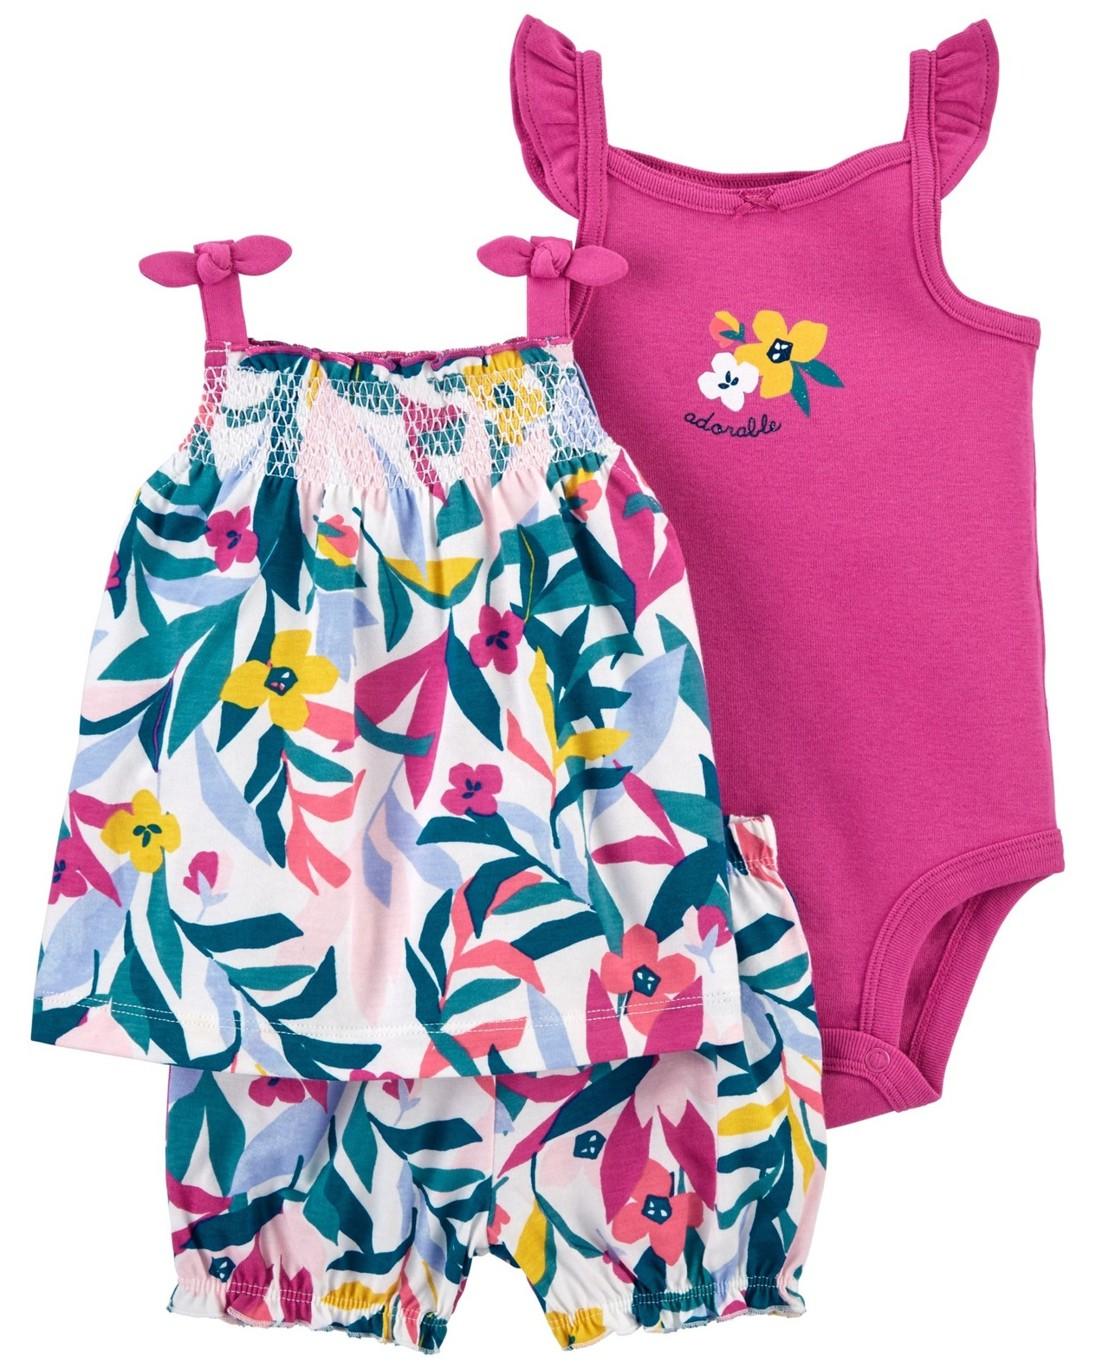 CARTER'S Set 3dielny body tielko, tunika, nohavice kr. Multi Floral dievča 12 m, veľ. 80